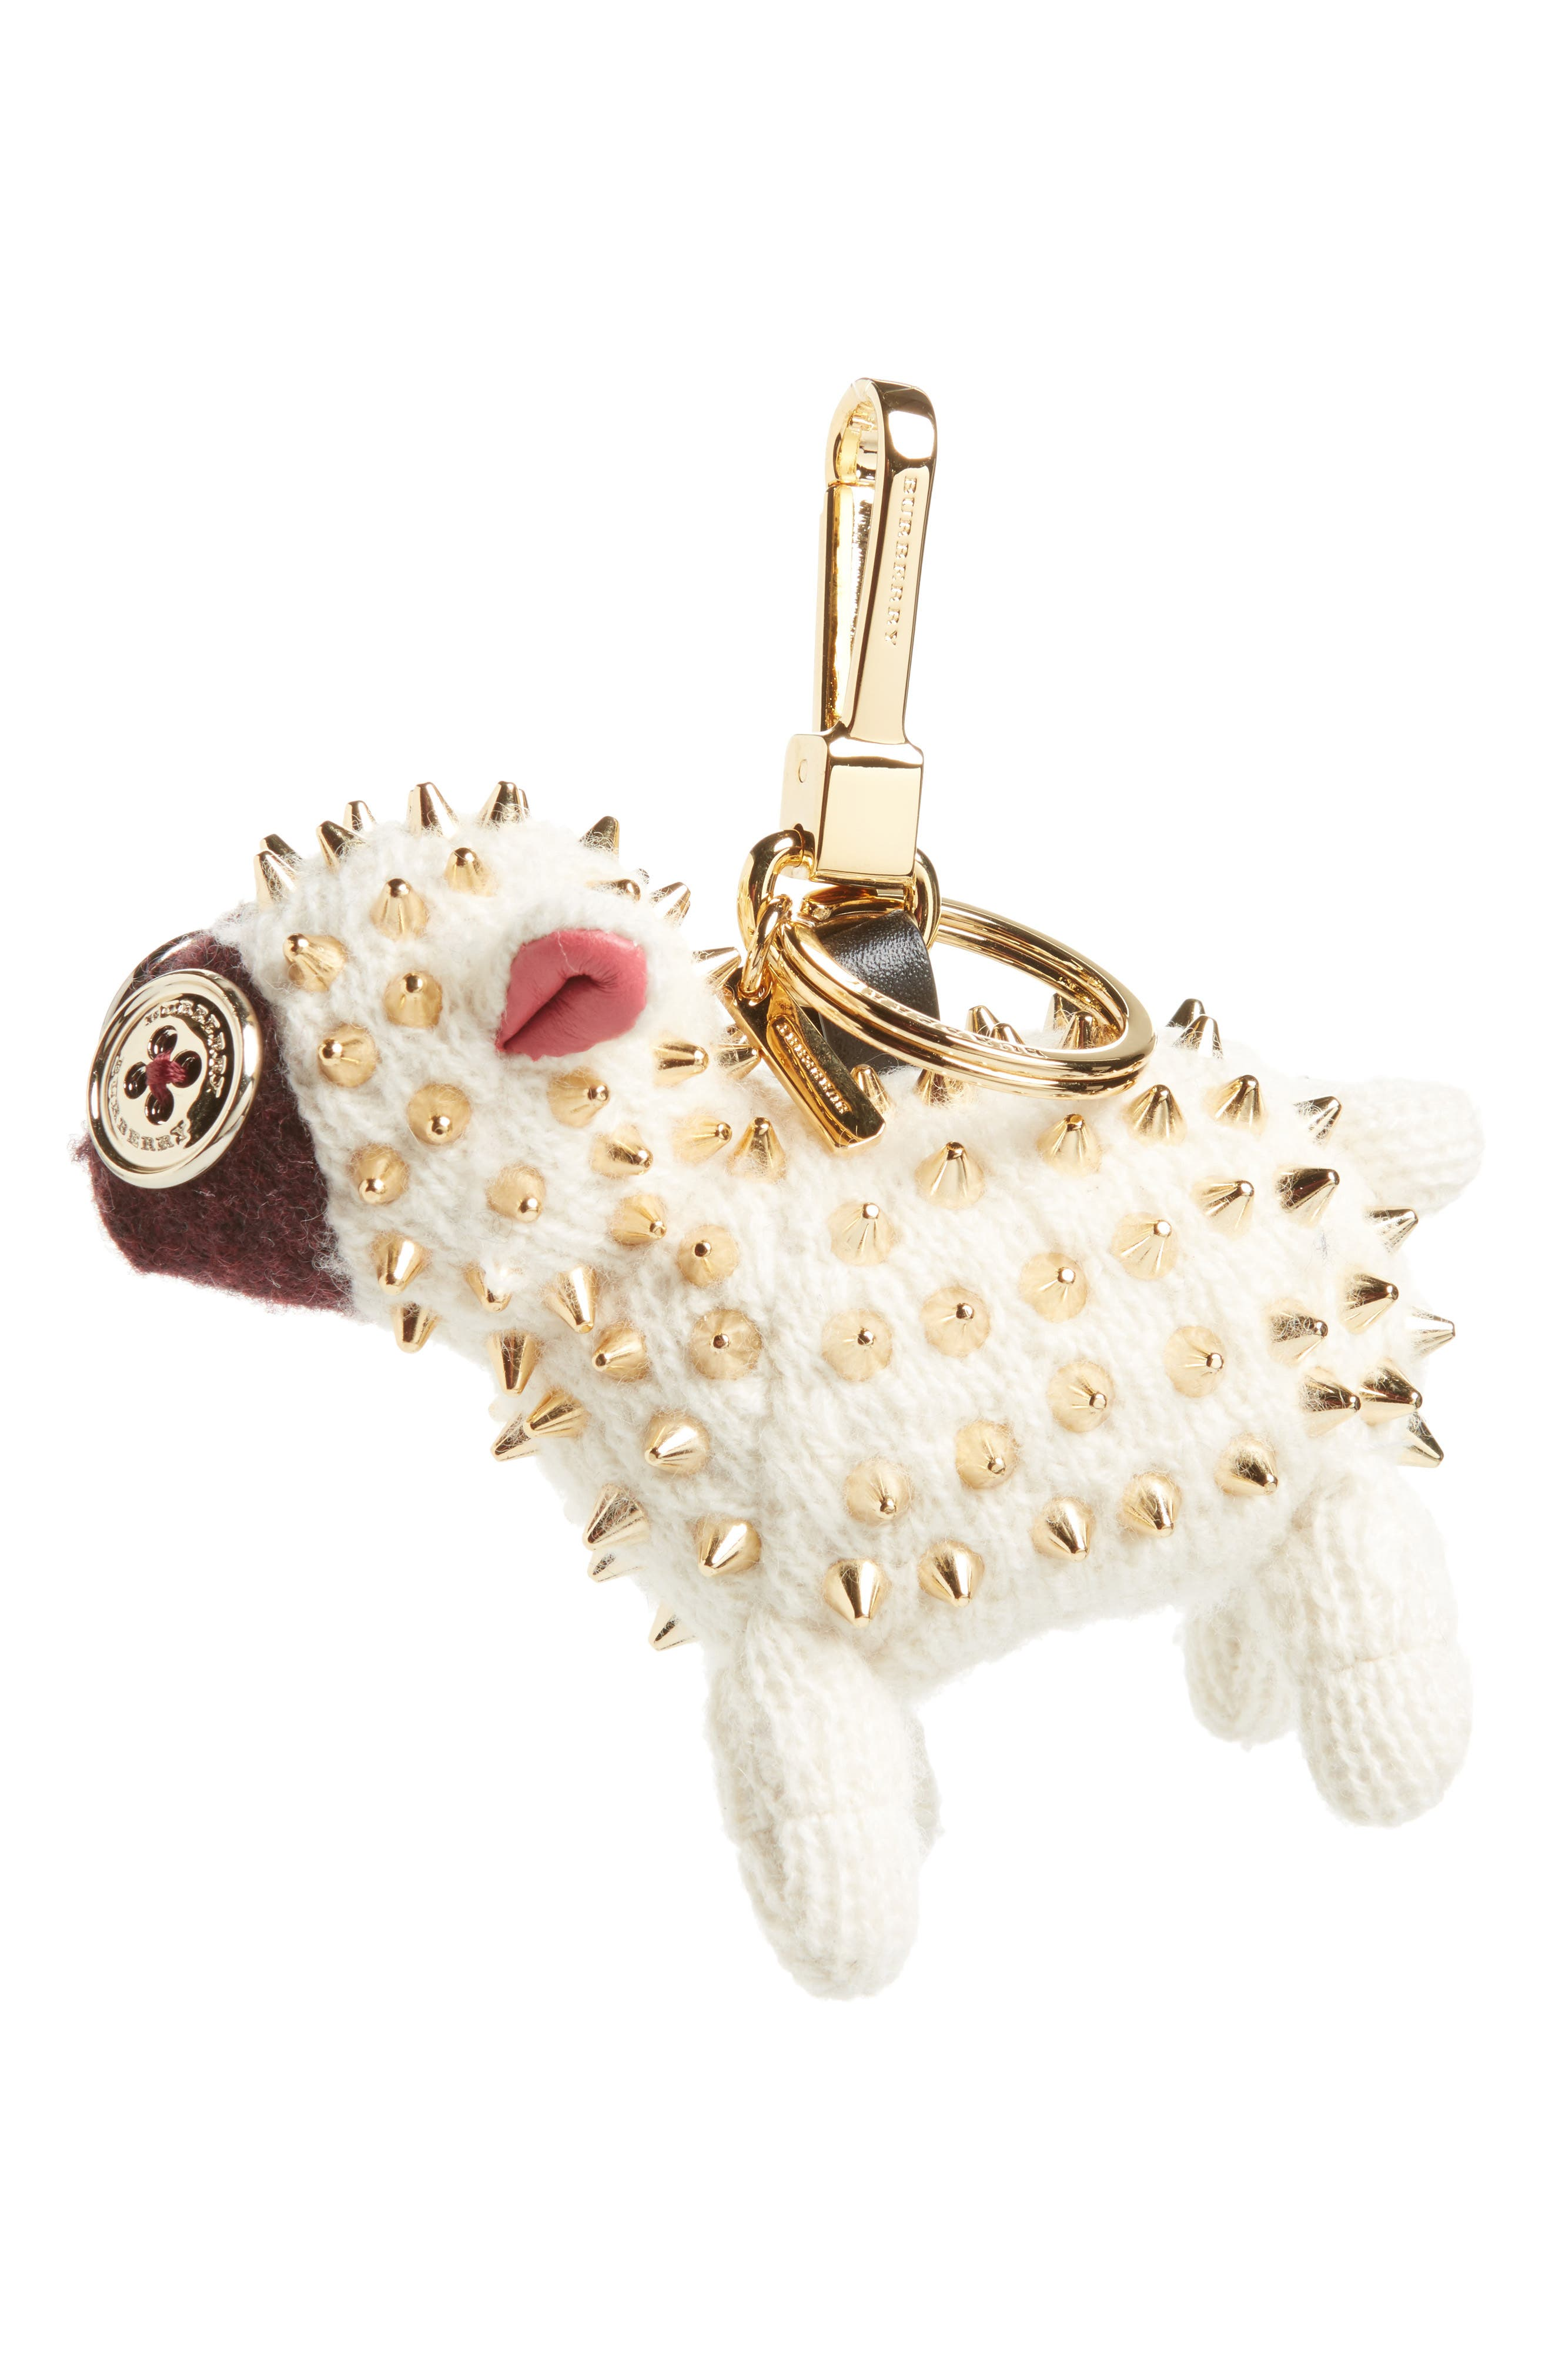 Main Image - Burberry Wendy the Sheep Studded Cashmere Bag Charm